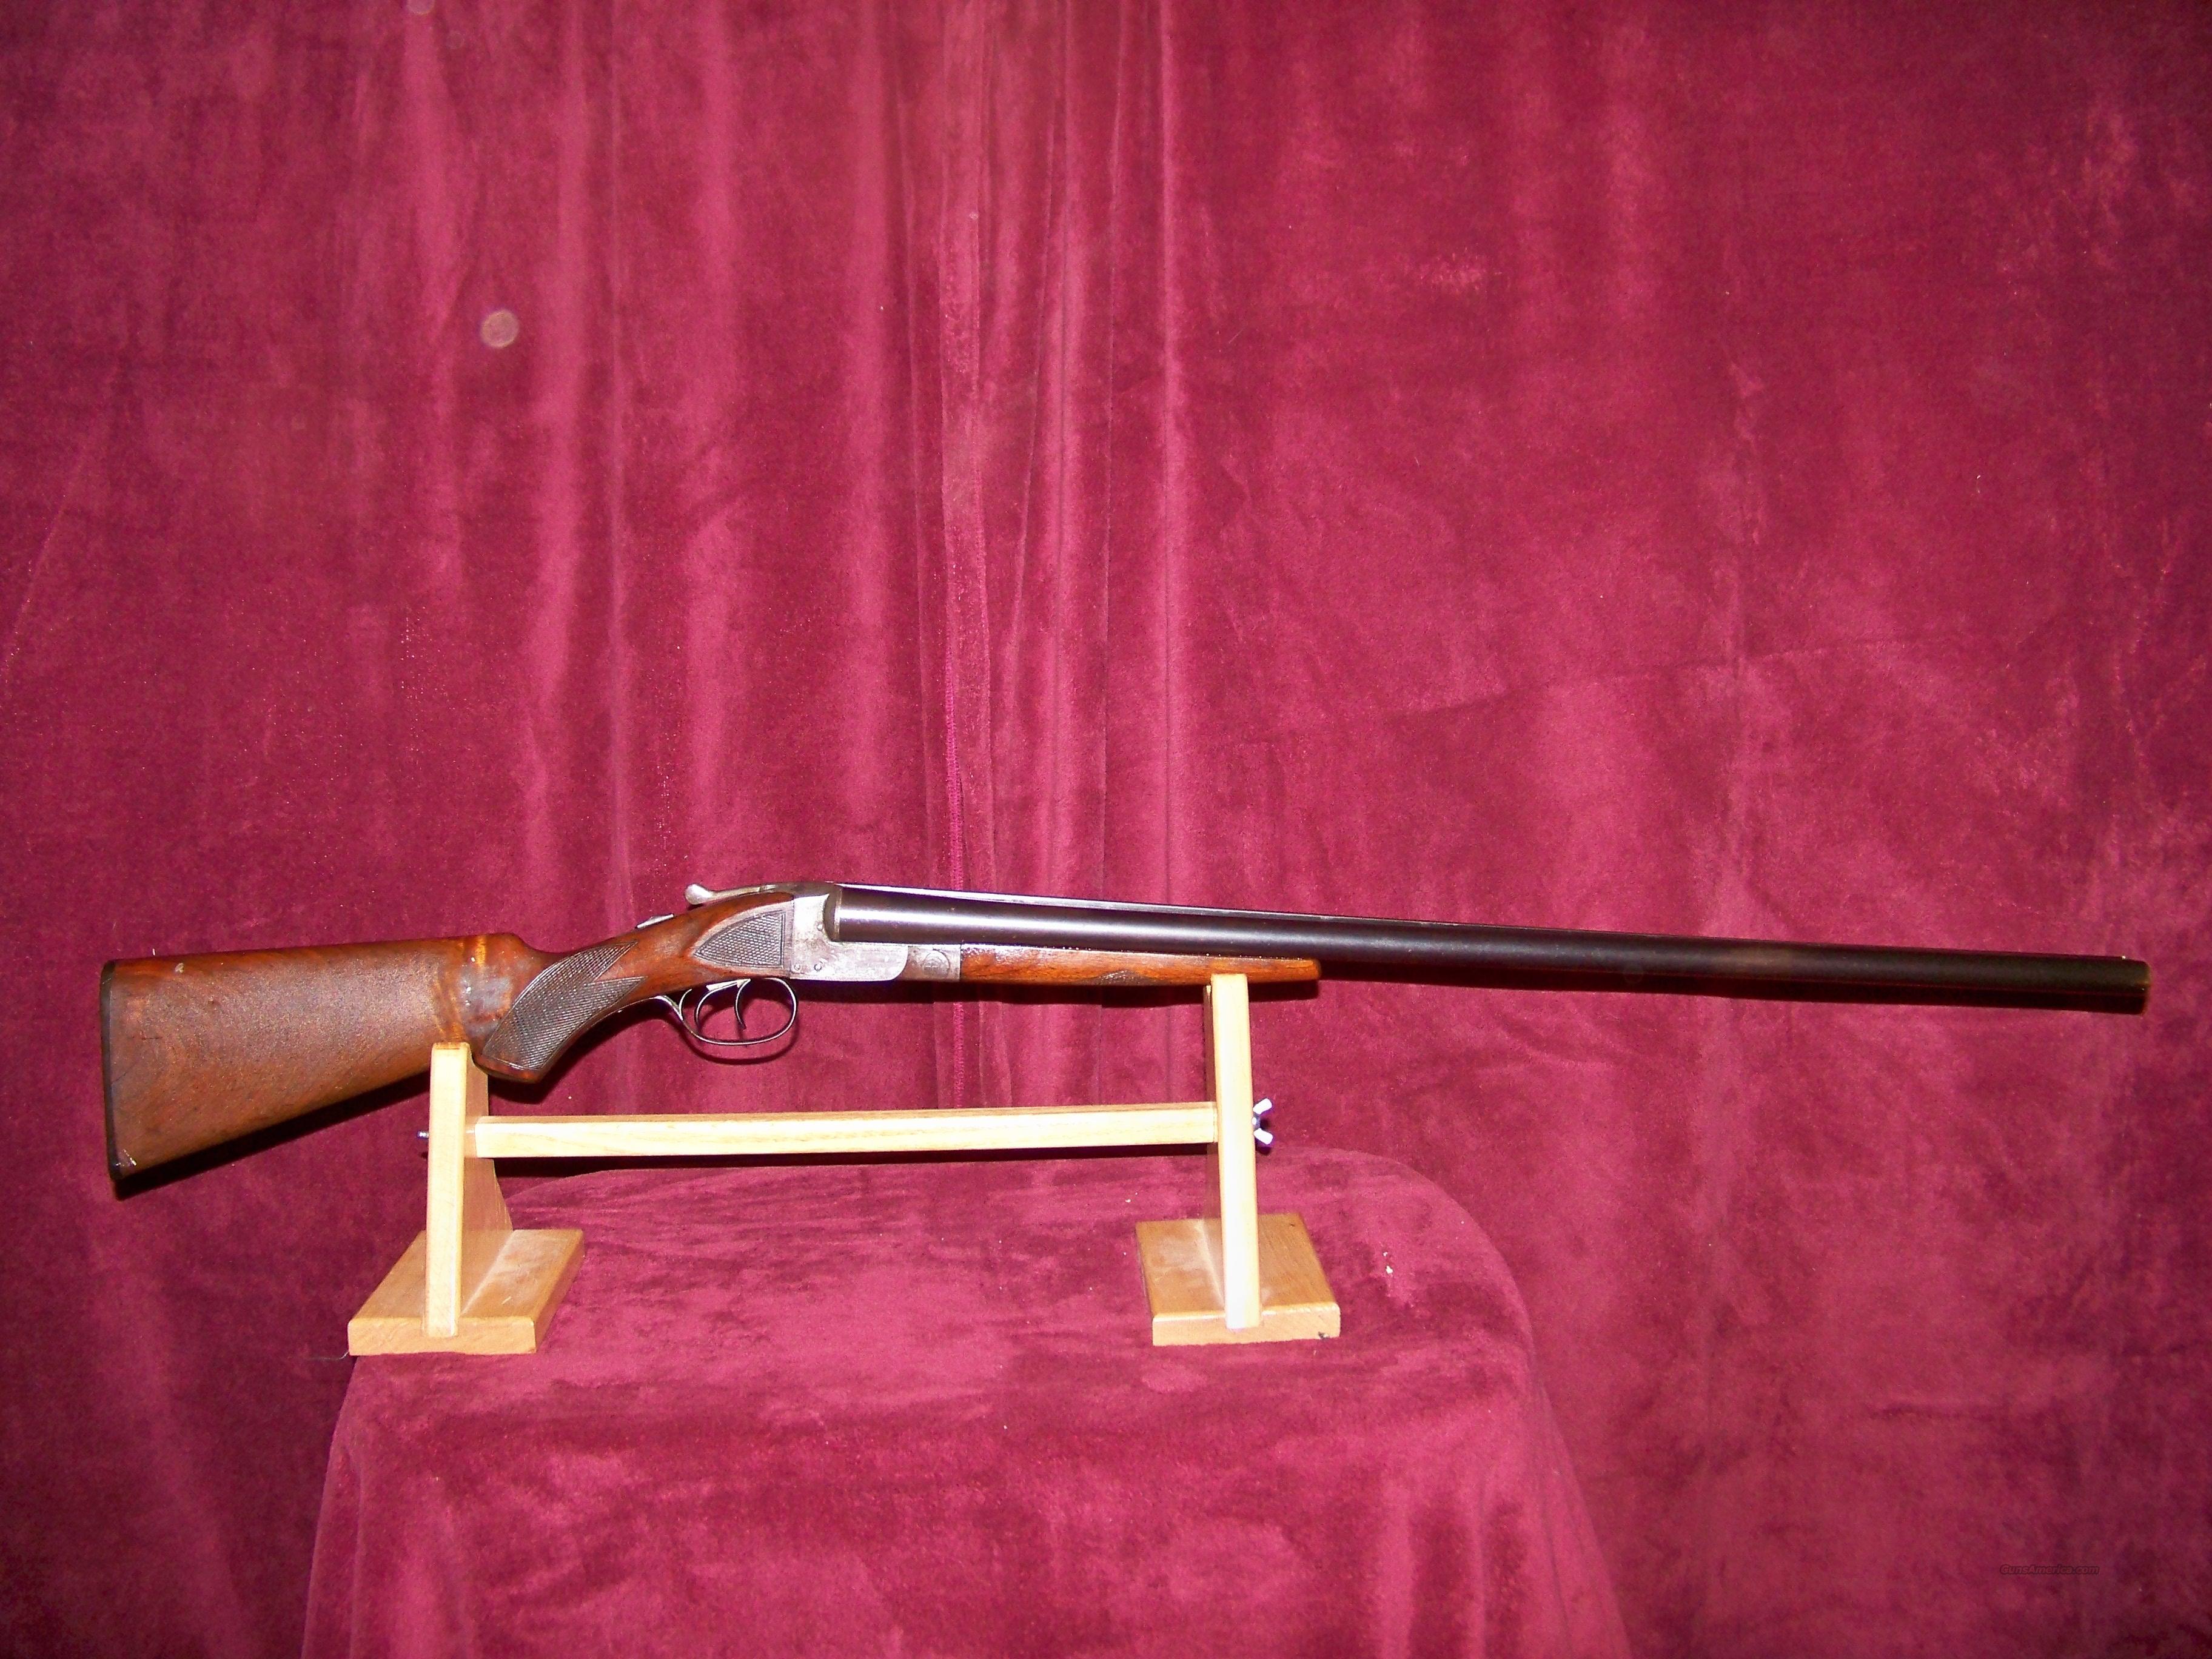 HUNTER ARMS FULTON SPECIAL  Guns > Shotguns > L.C. Smith Shotguns